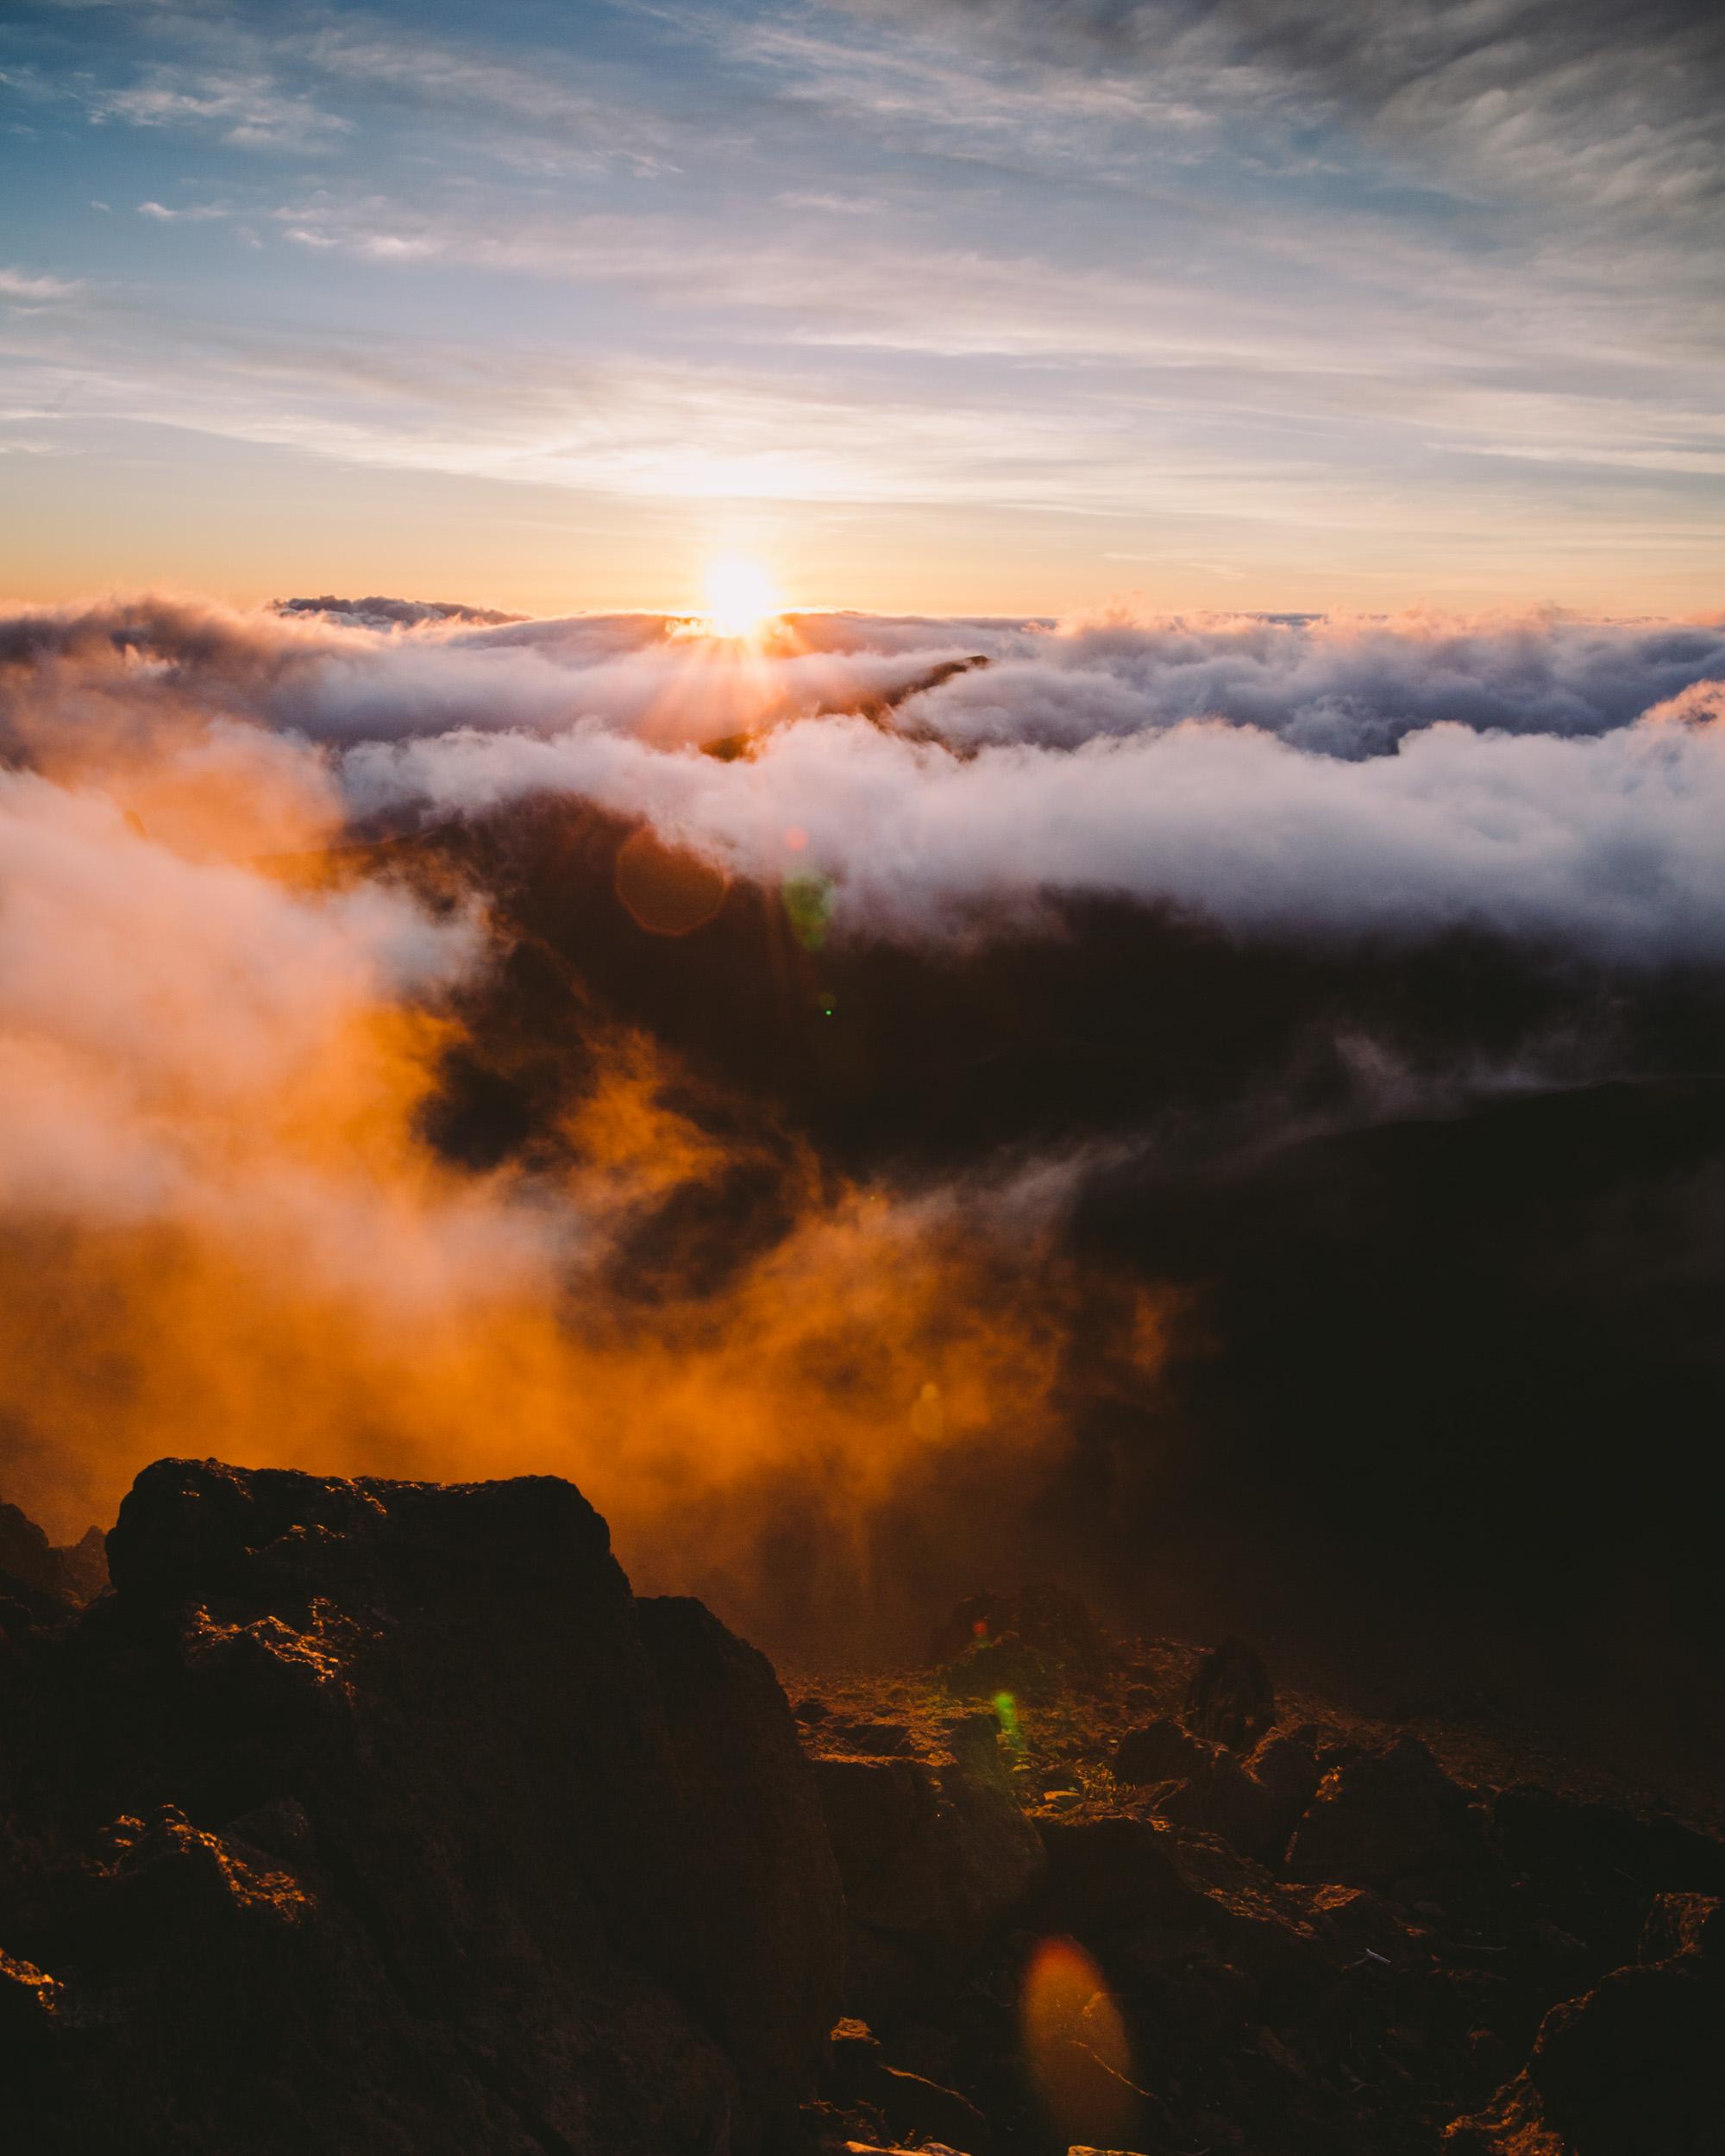 Sunrise golden hour by Adriel Callao |  @norcal_exp